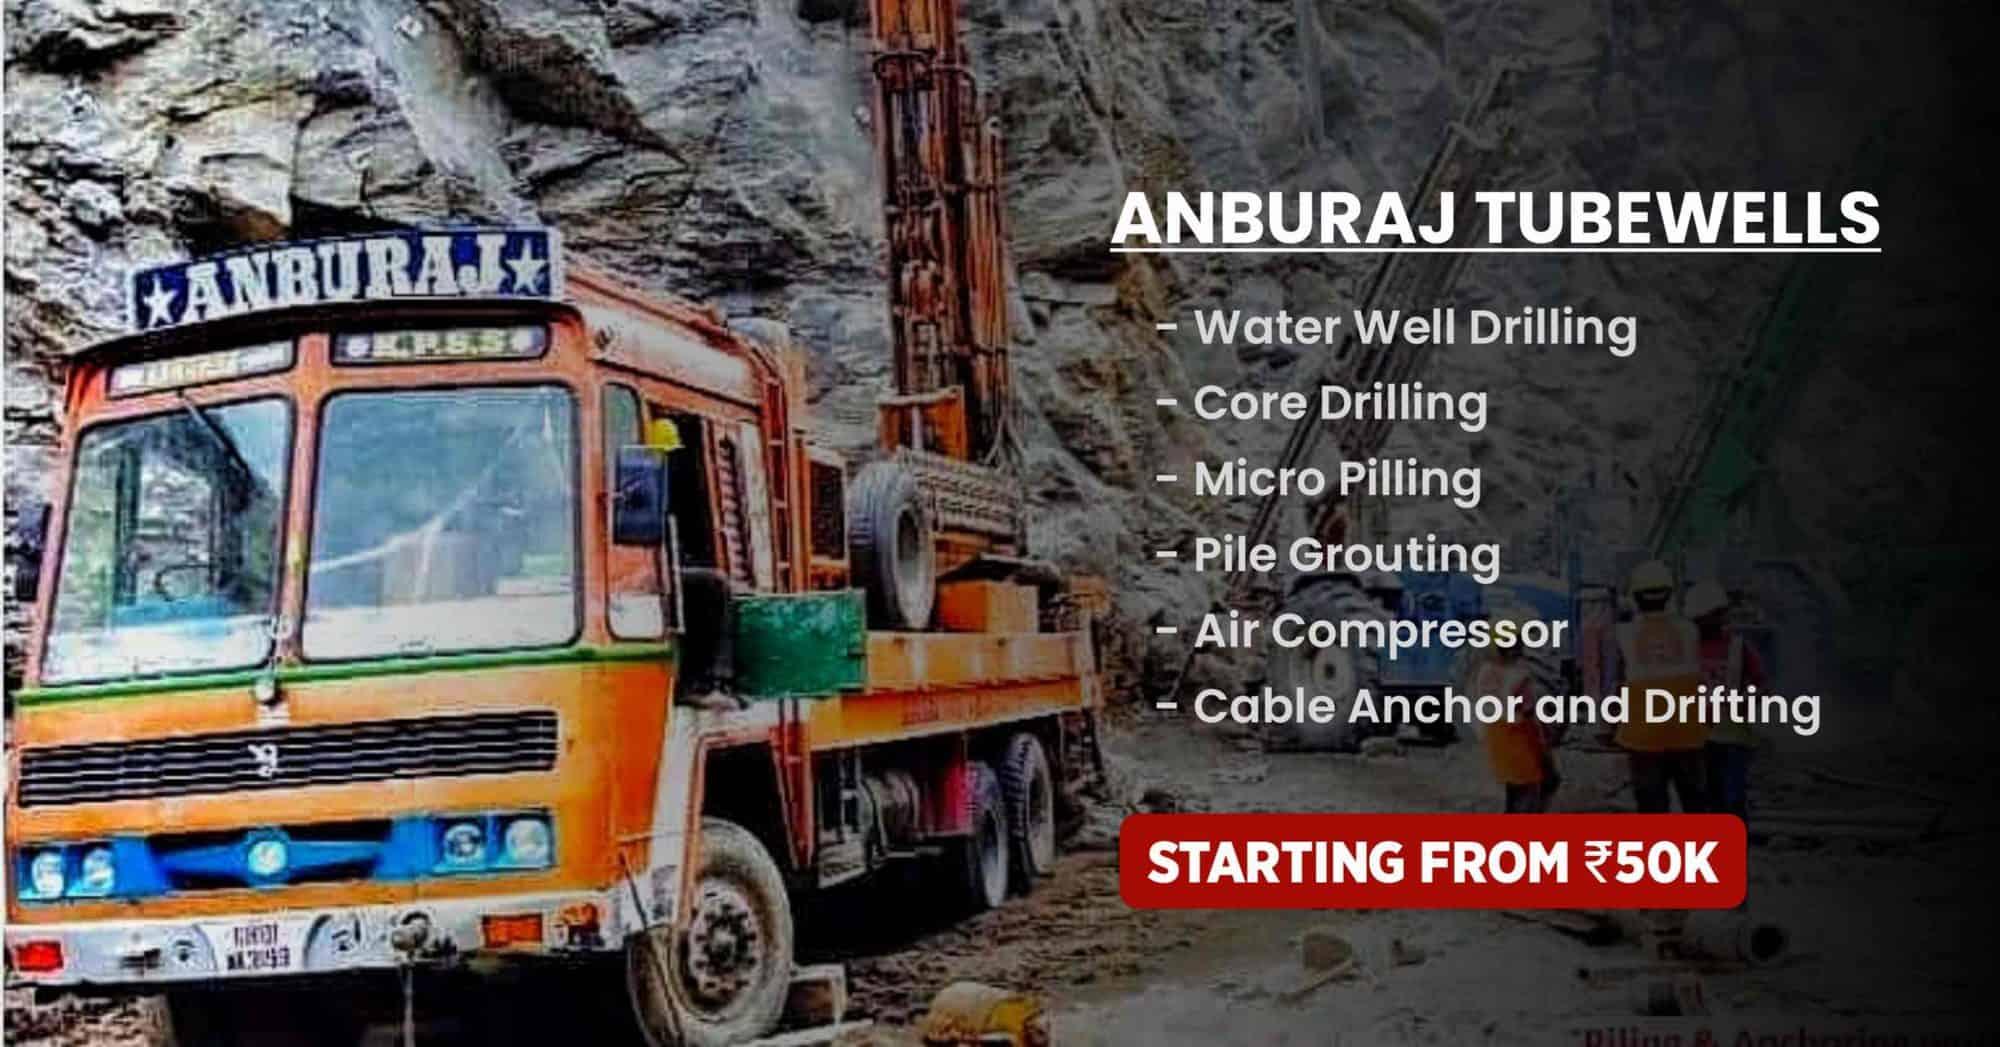 Anburaj Tubewells Services